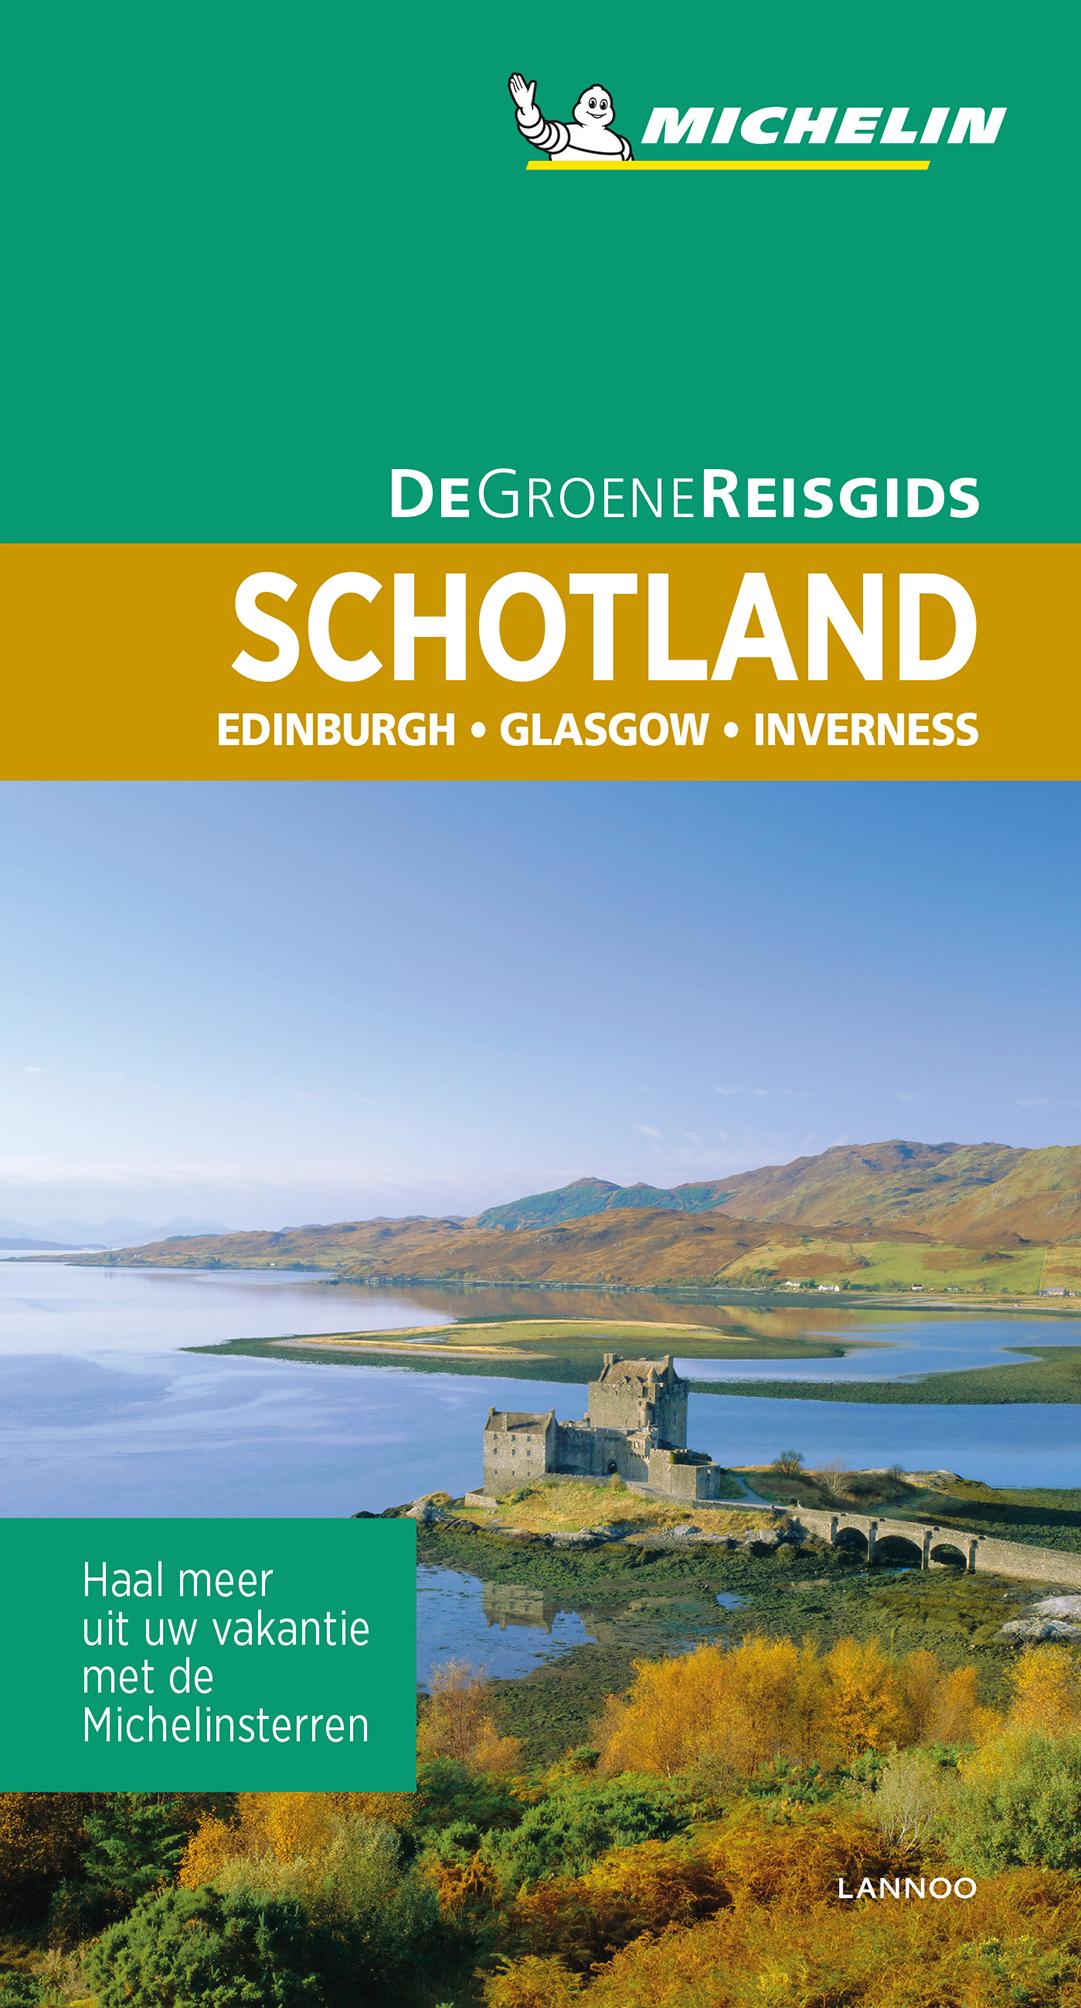 Schotland | Michelin reisgids 9789401457378  Michelin Michelin Groene gidsen  Reisgidsen Schotland